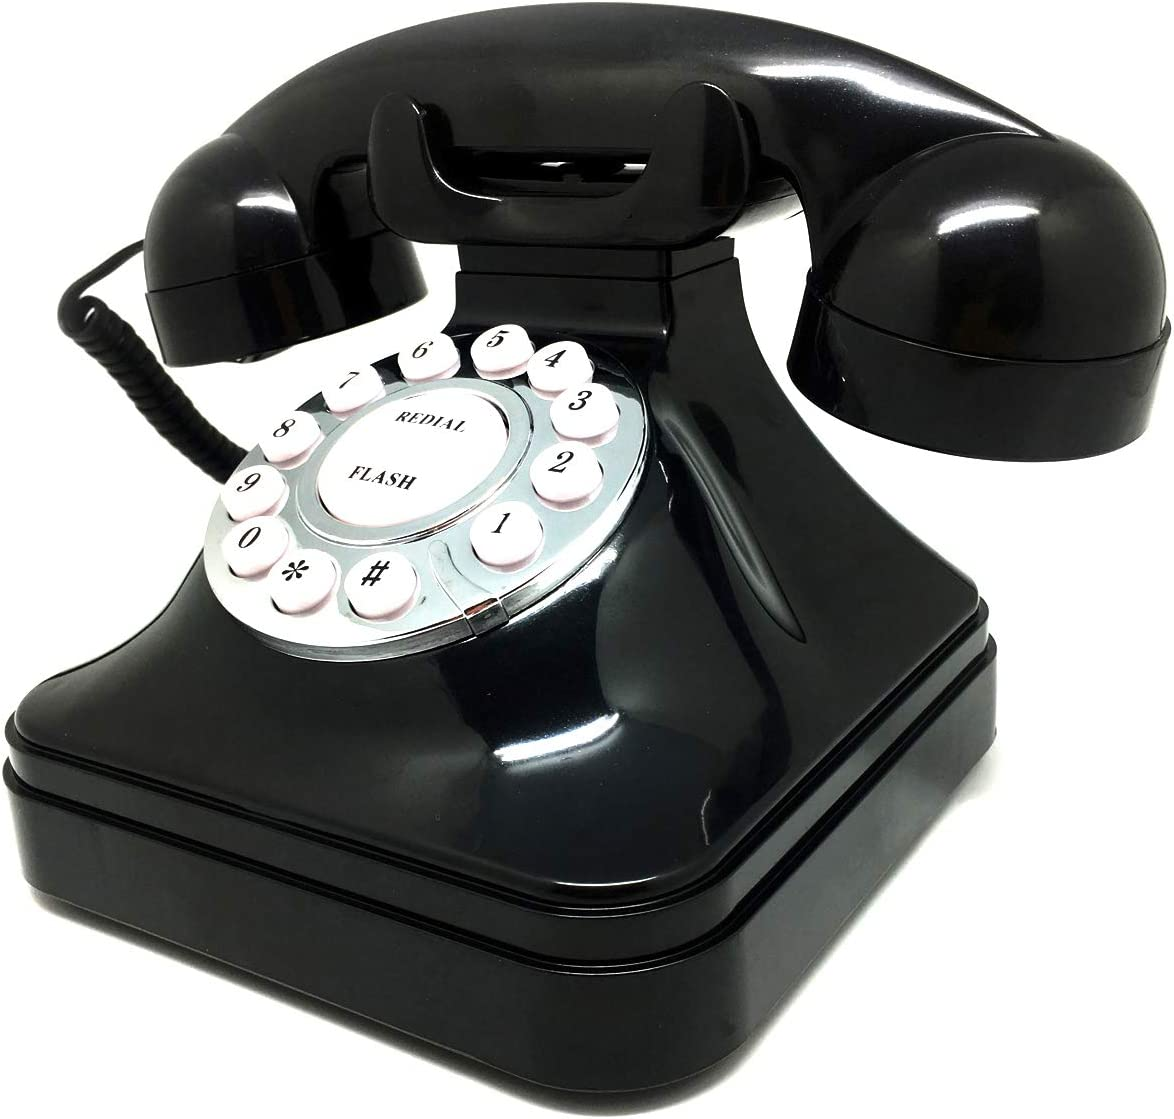 Asiawill Retro Vintage Antique Telephone Landline Home Office Desktop Phone Retro Wired Landline Phone Telephone - Black